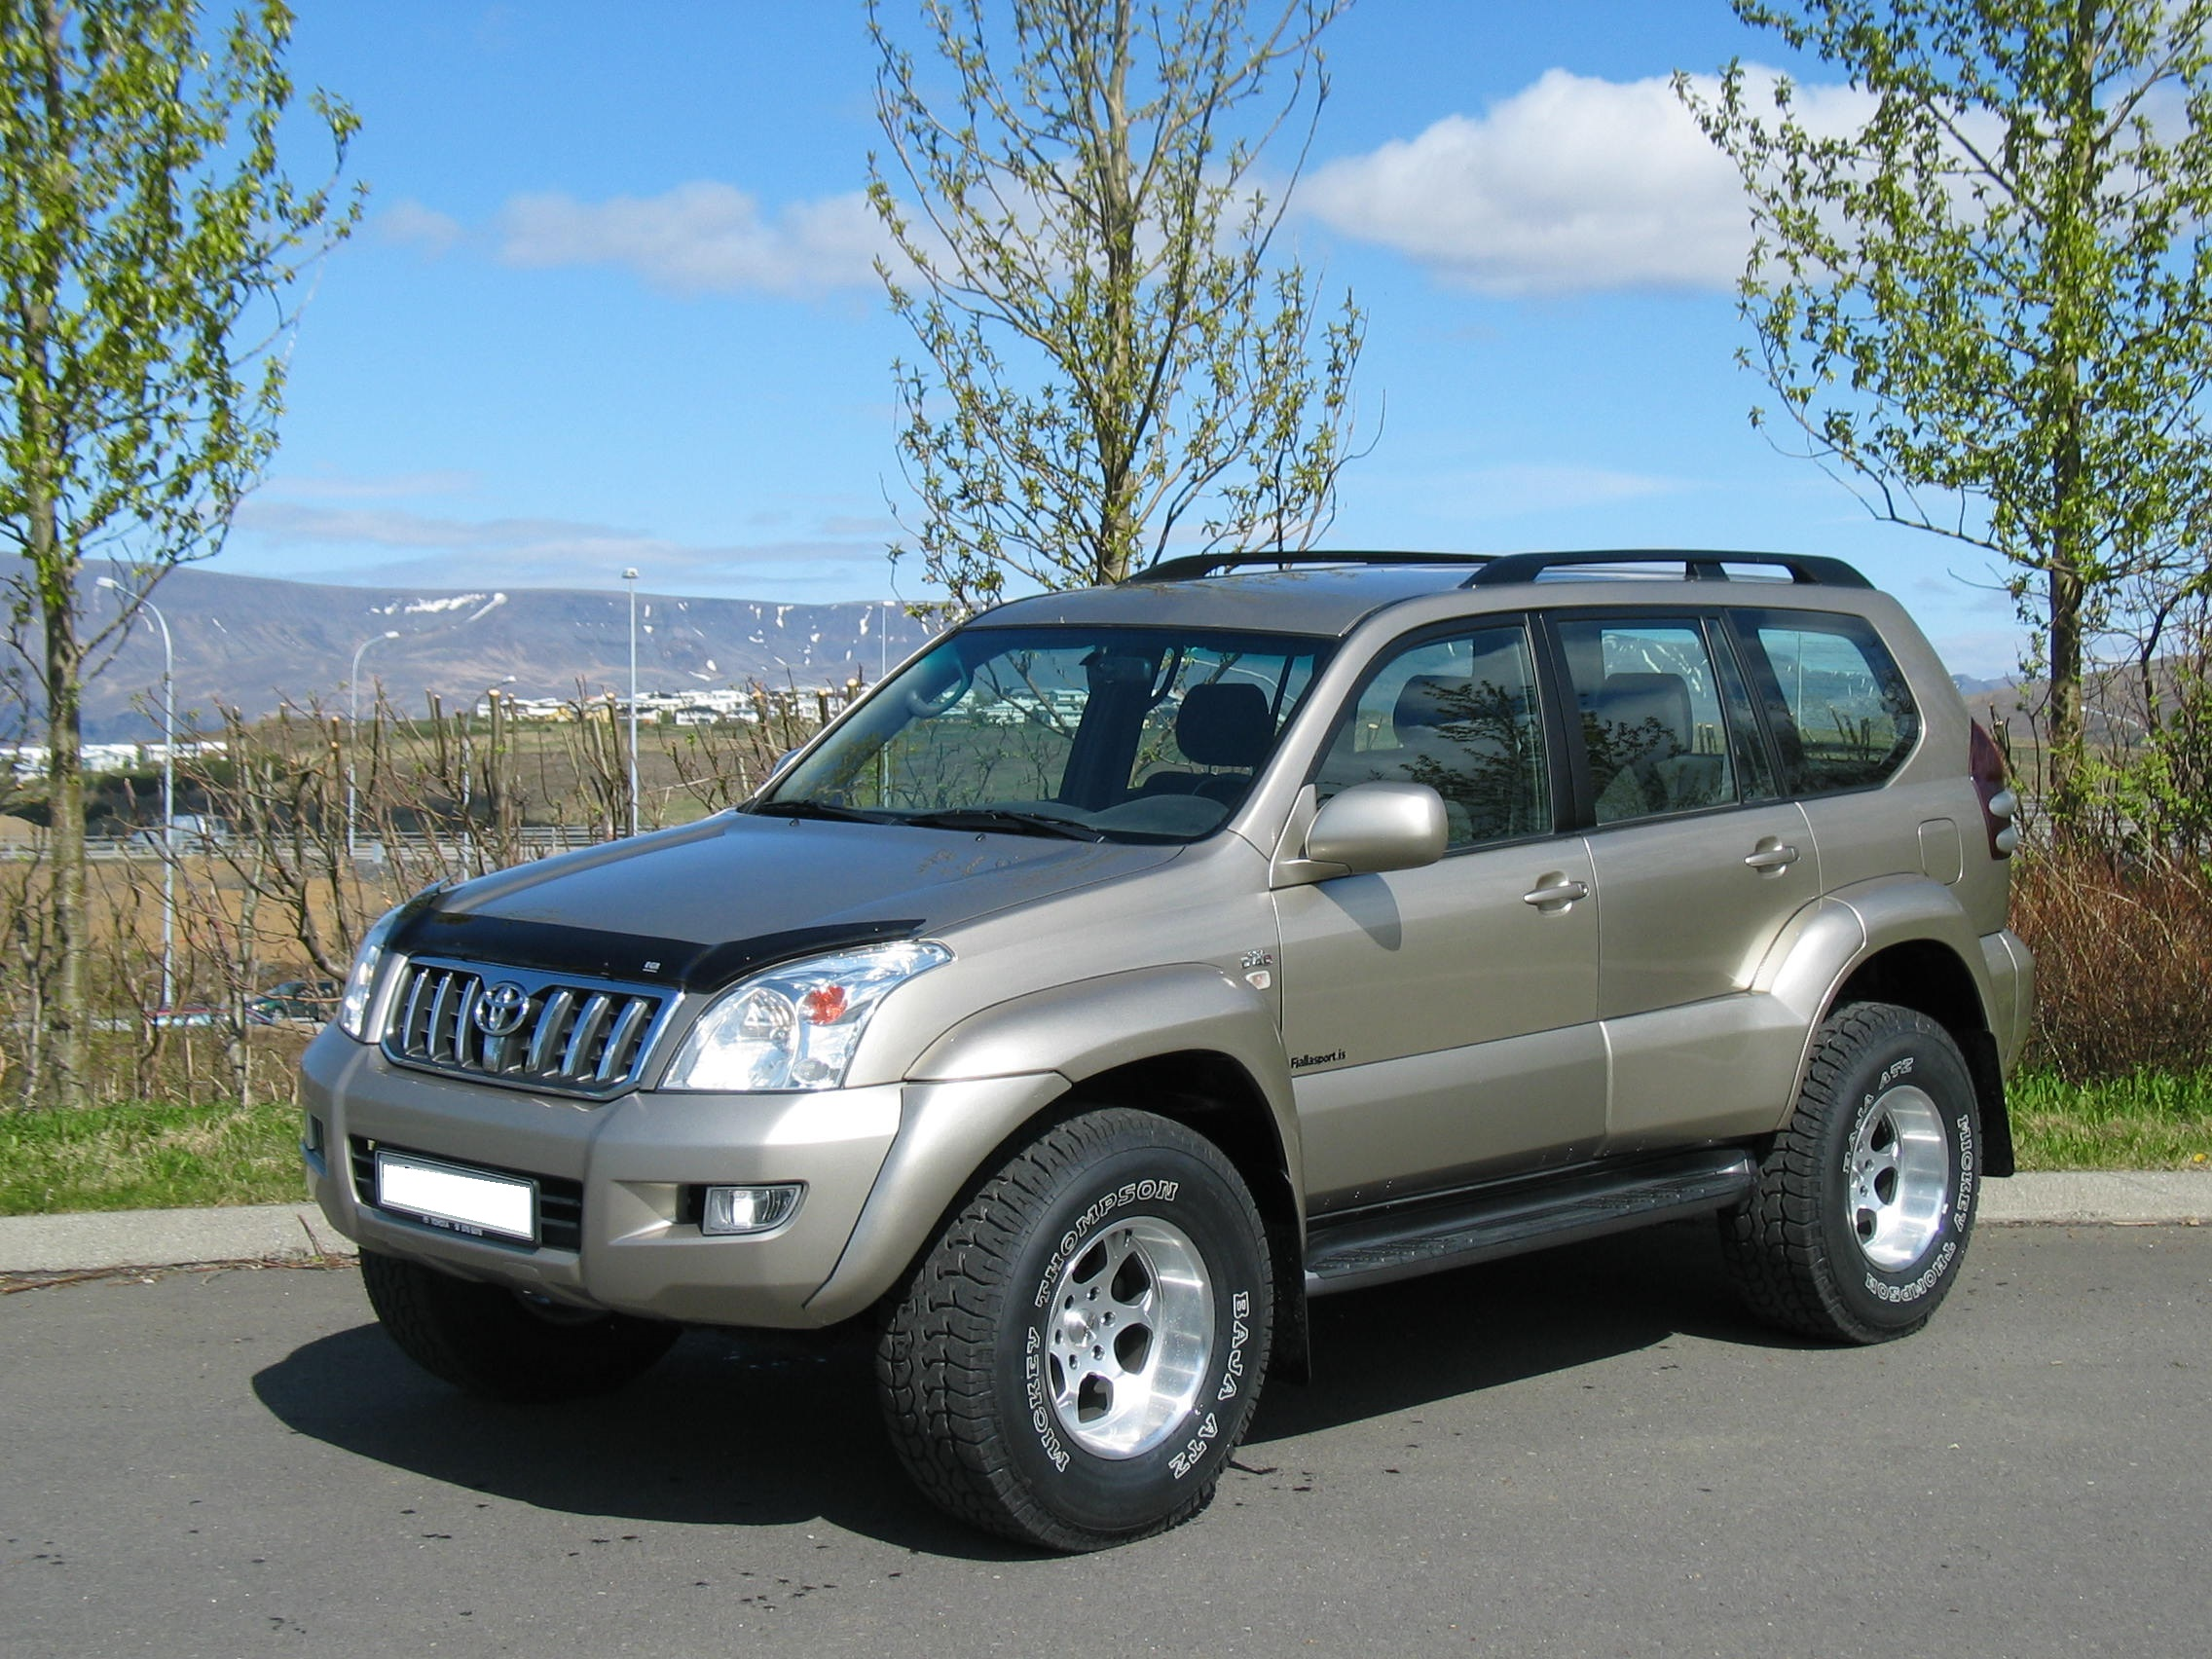 LC120-35-tommu-2007-020